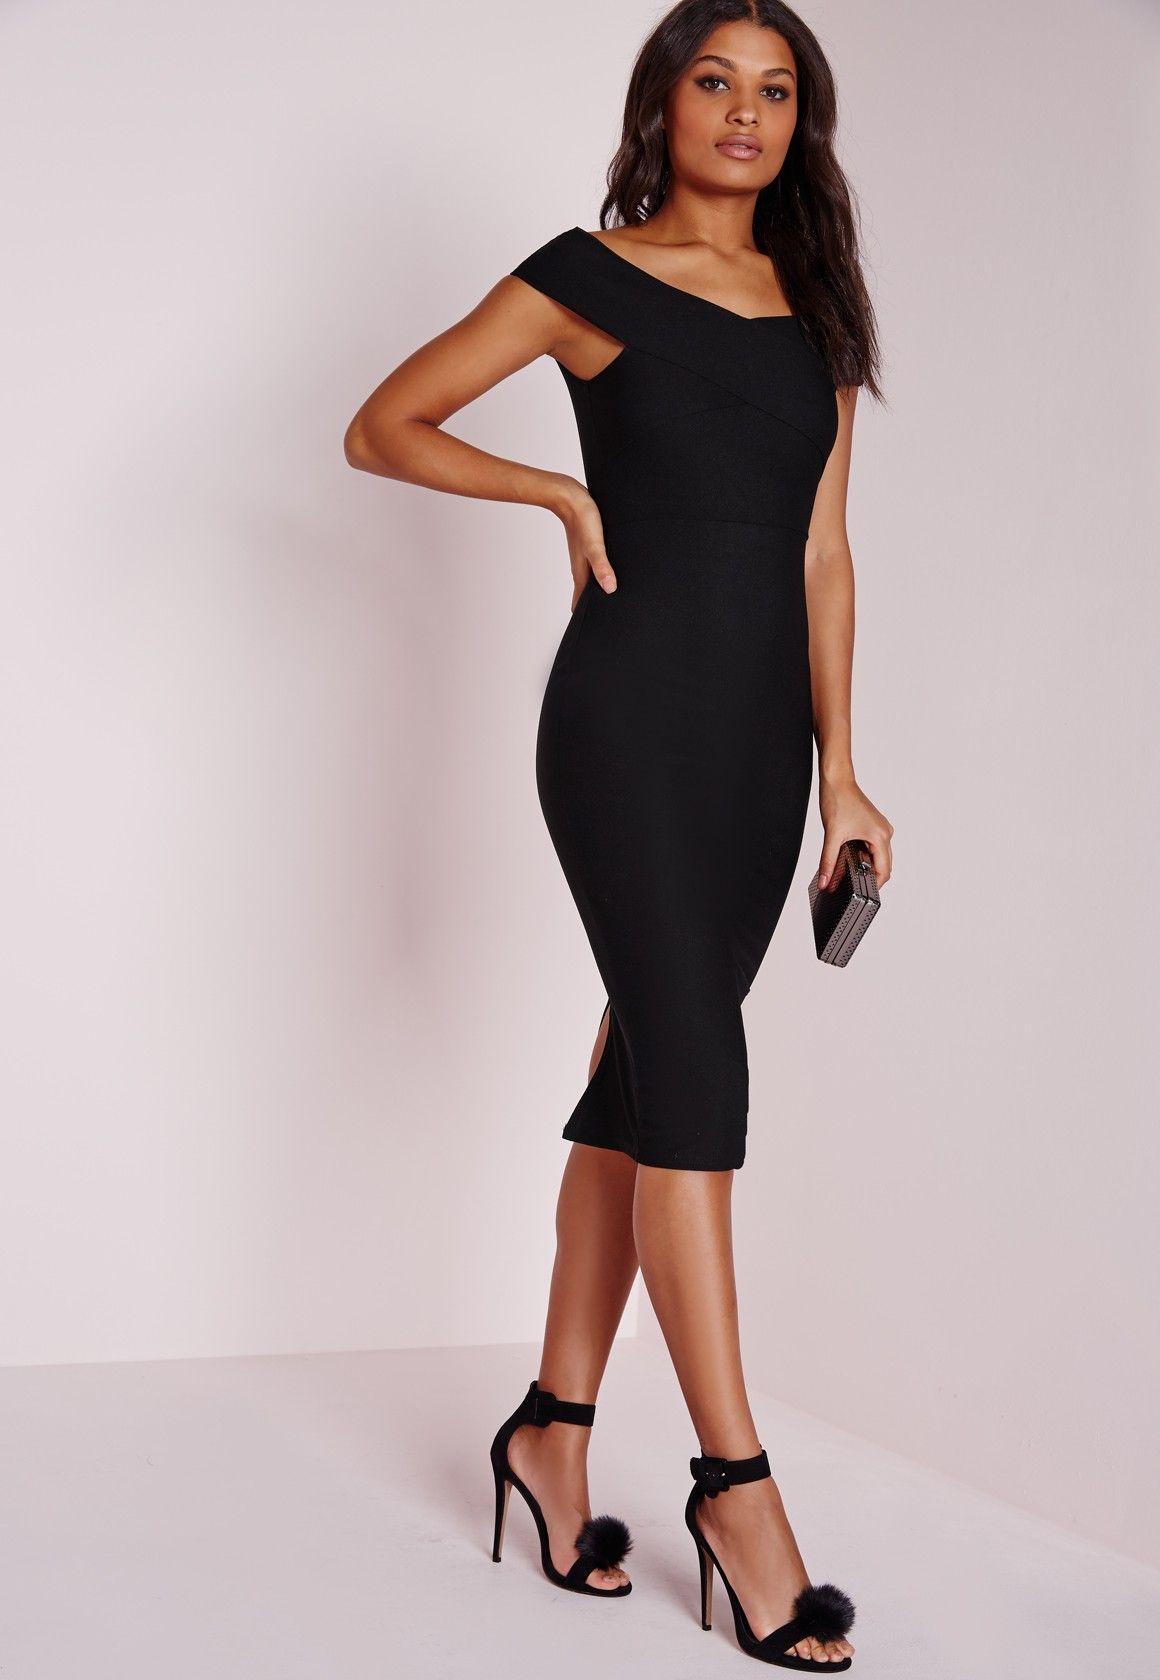 Missguided Crepe Bardot Midi Dress Black With Images Dresses Bardot Midi Dress Black Midi Dress [ 1680 x 1160 Pixel ]